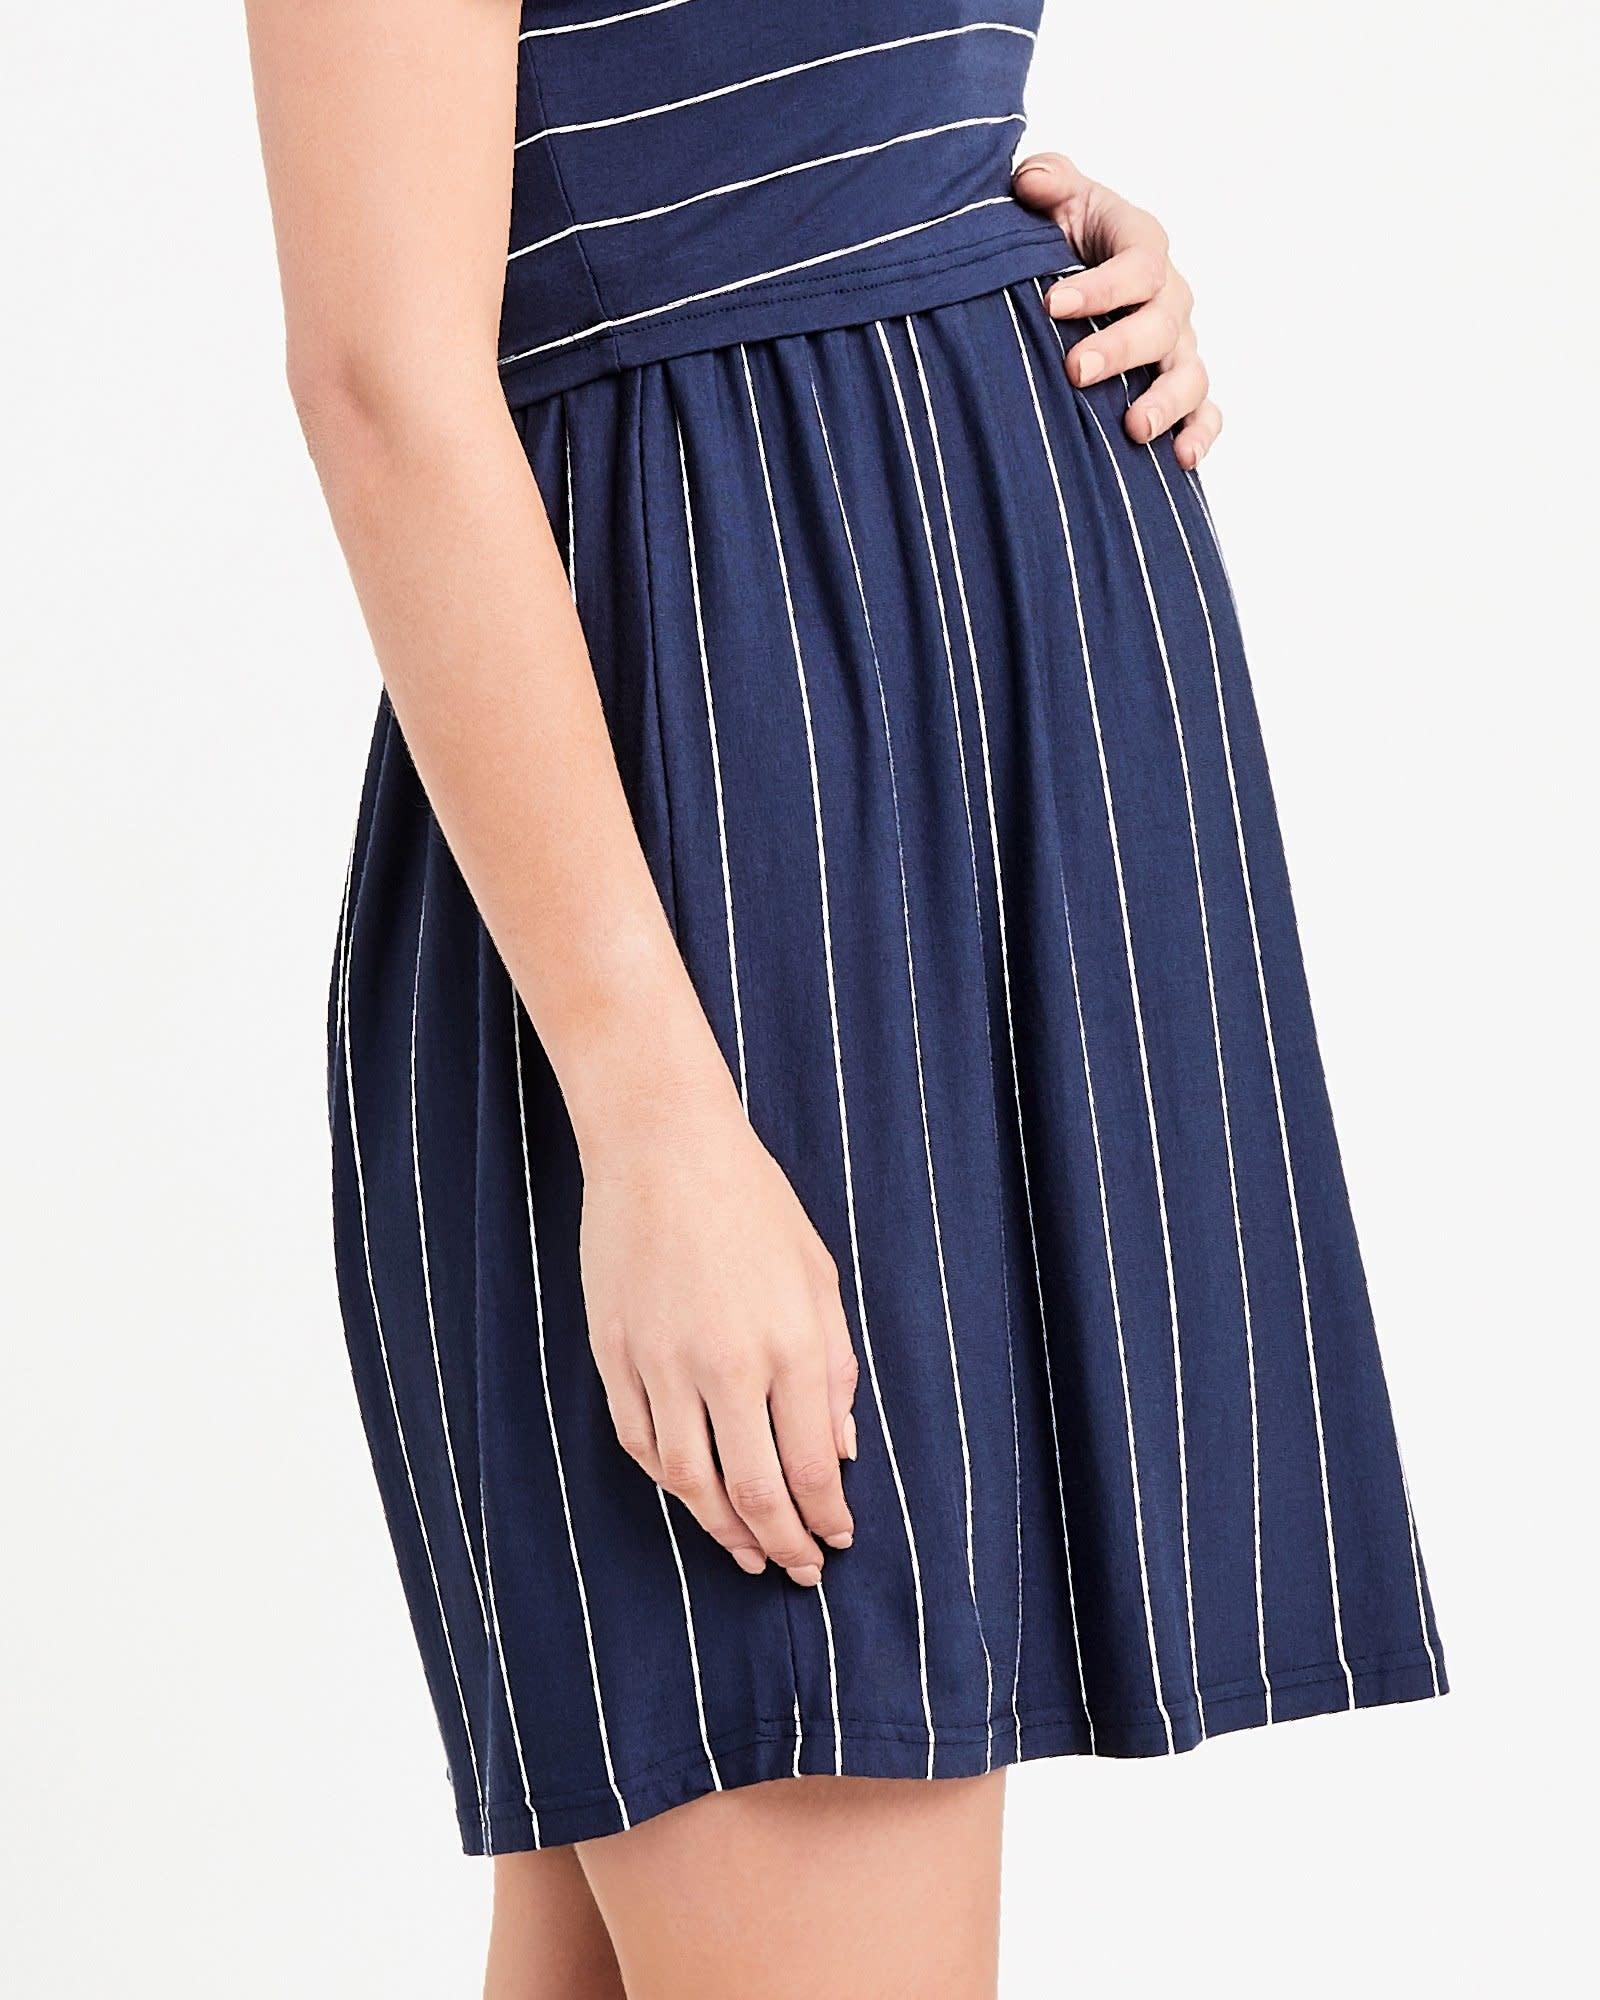 Crop Top Nursing Dress